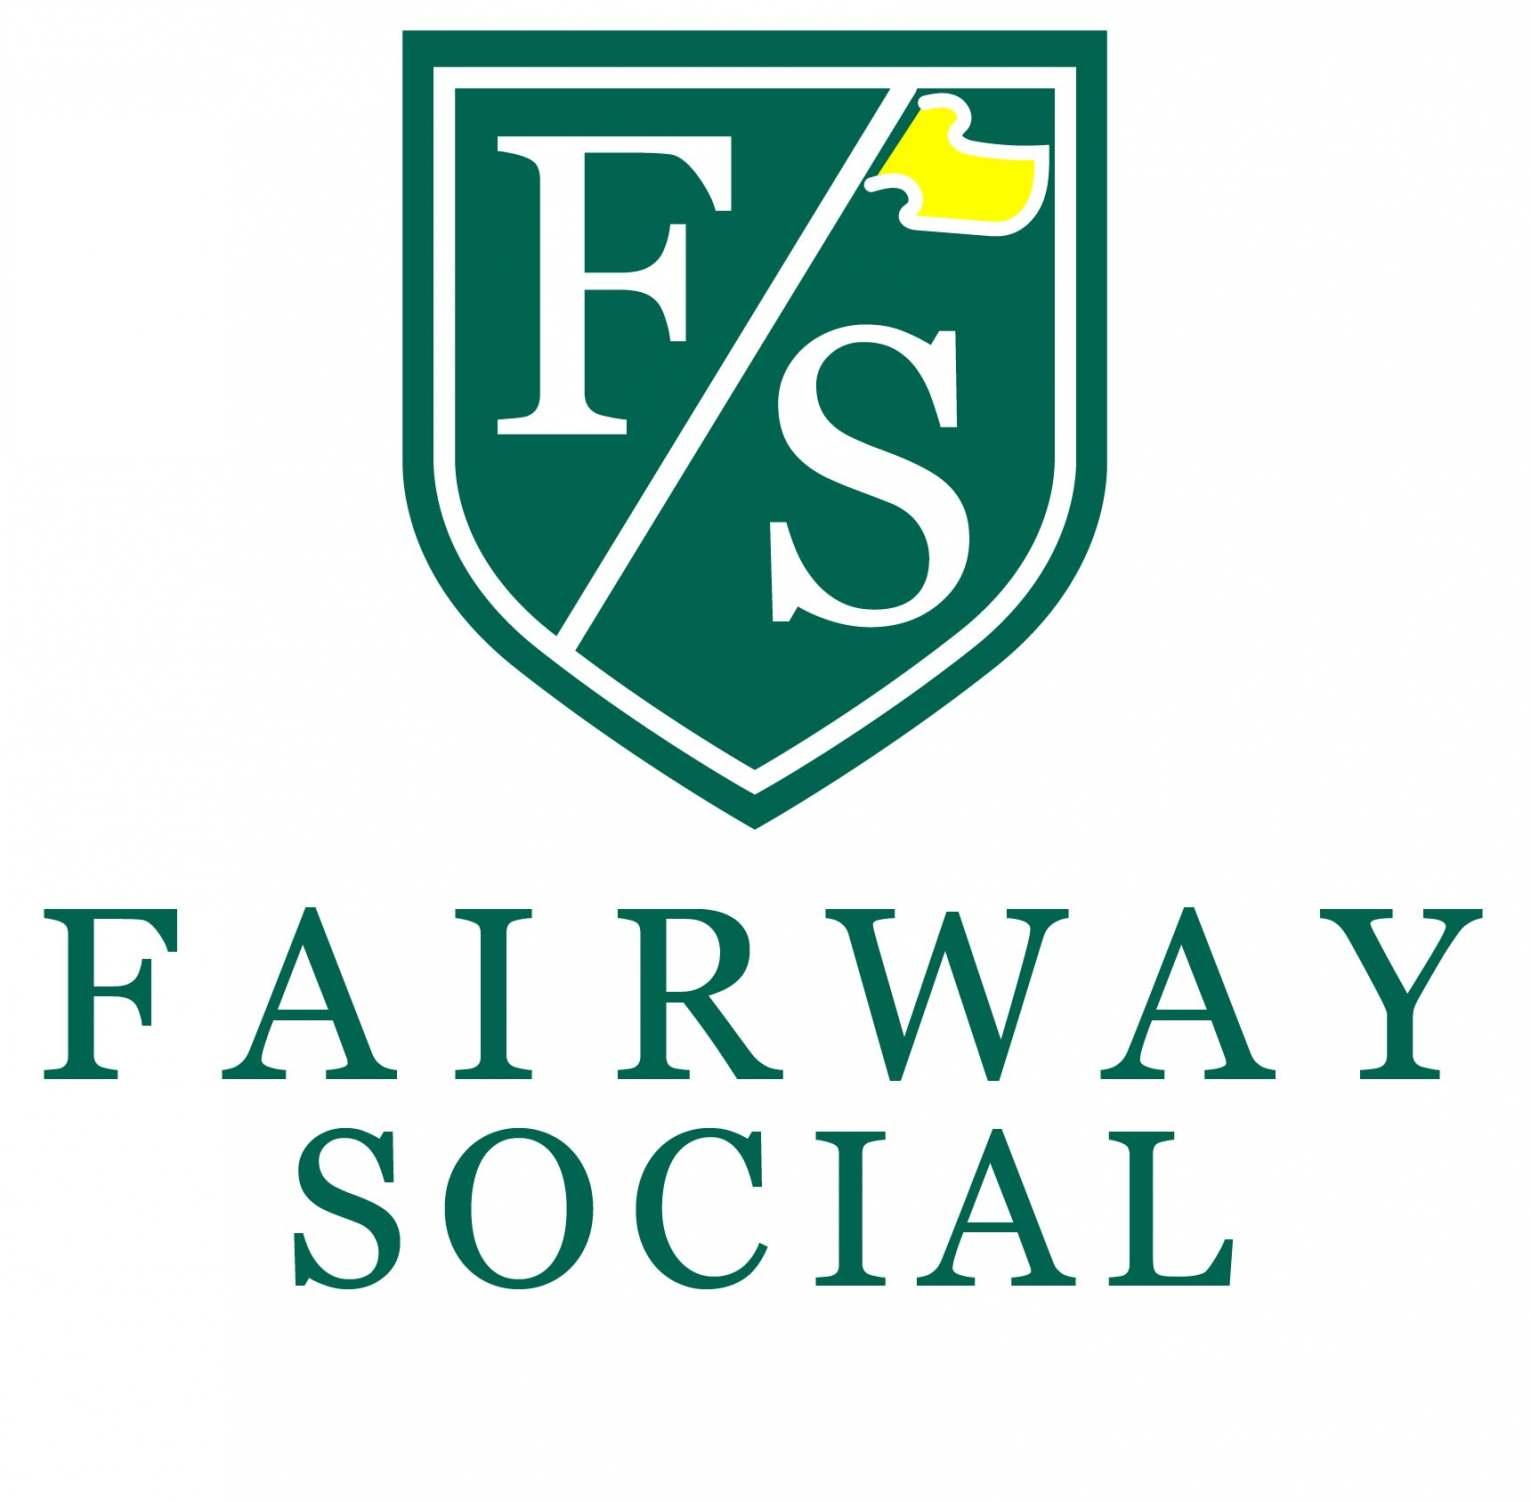 Fairway Social Logo